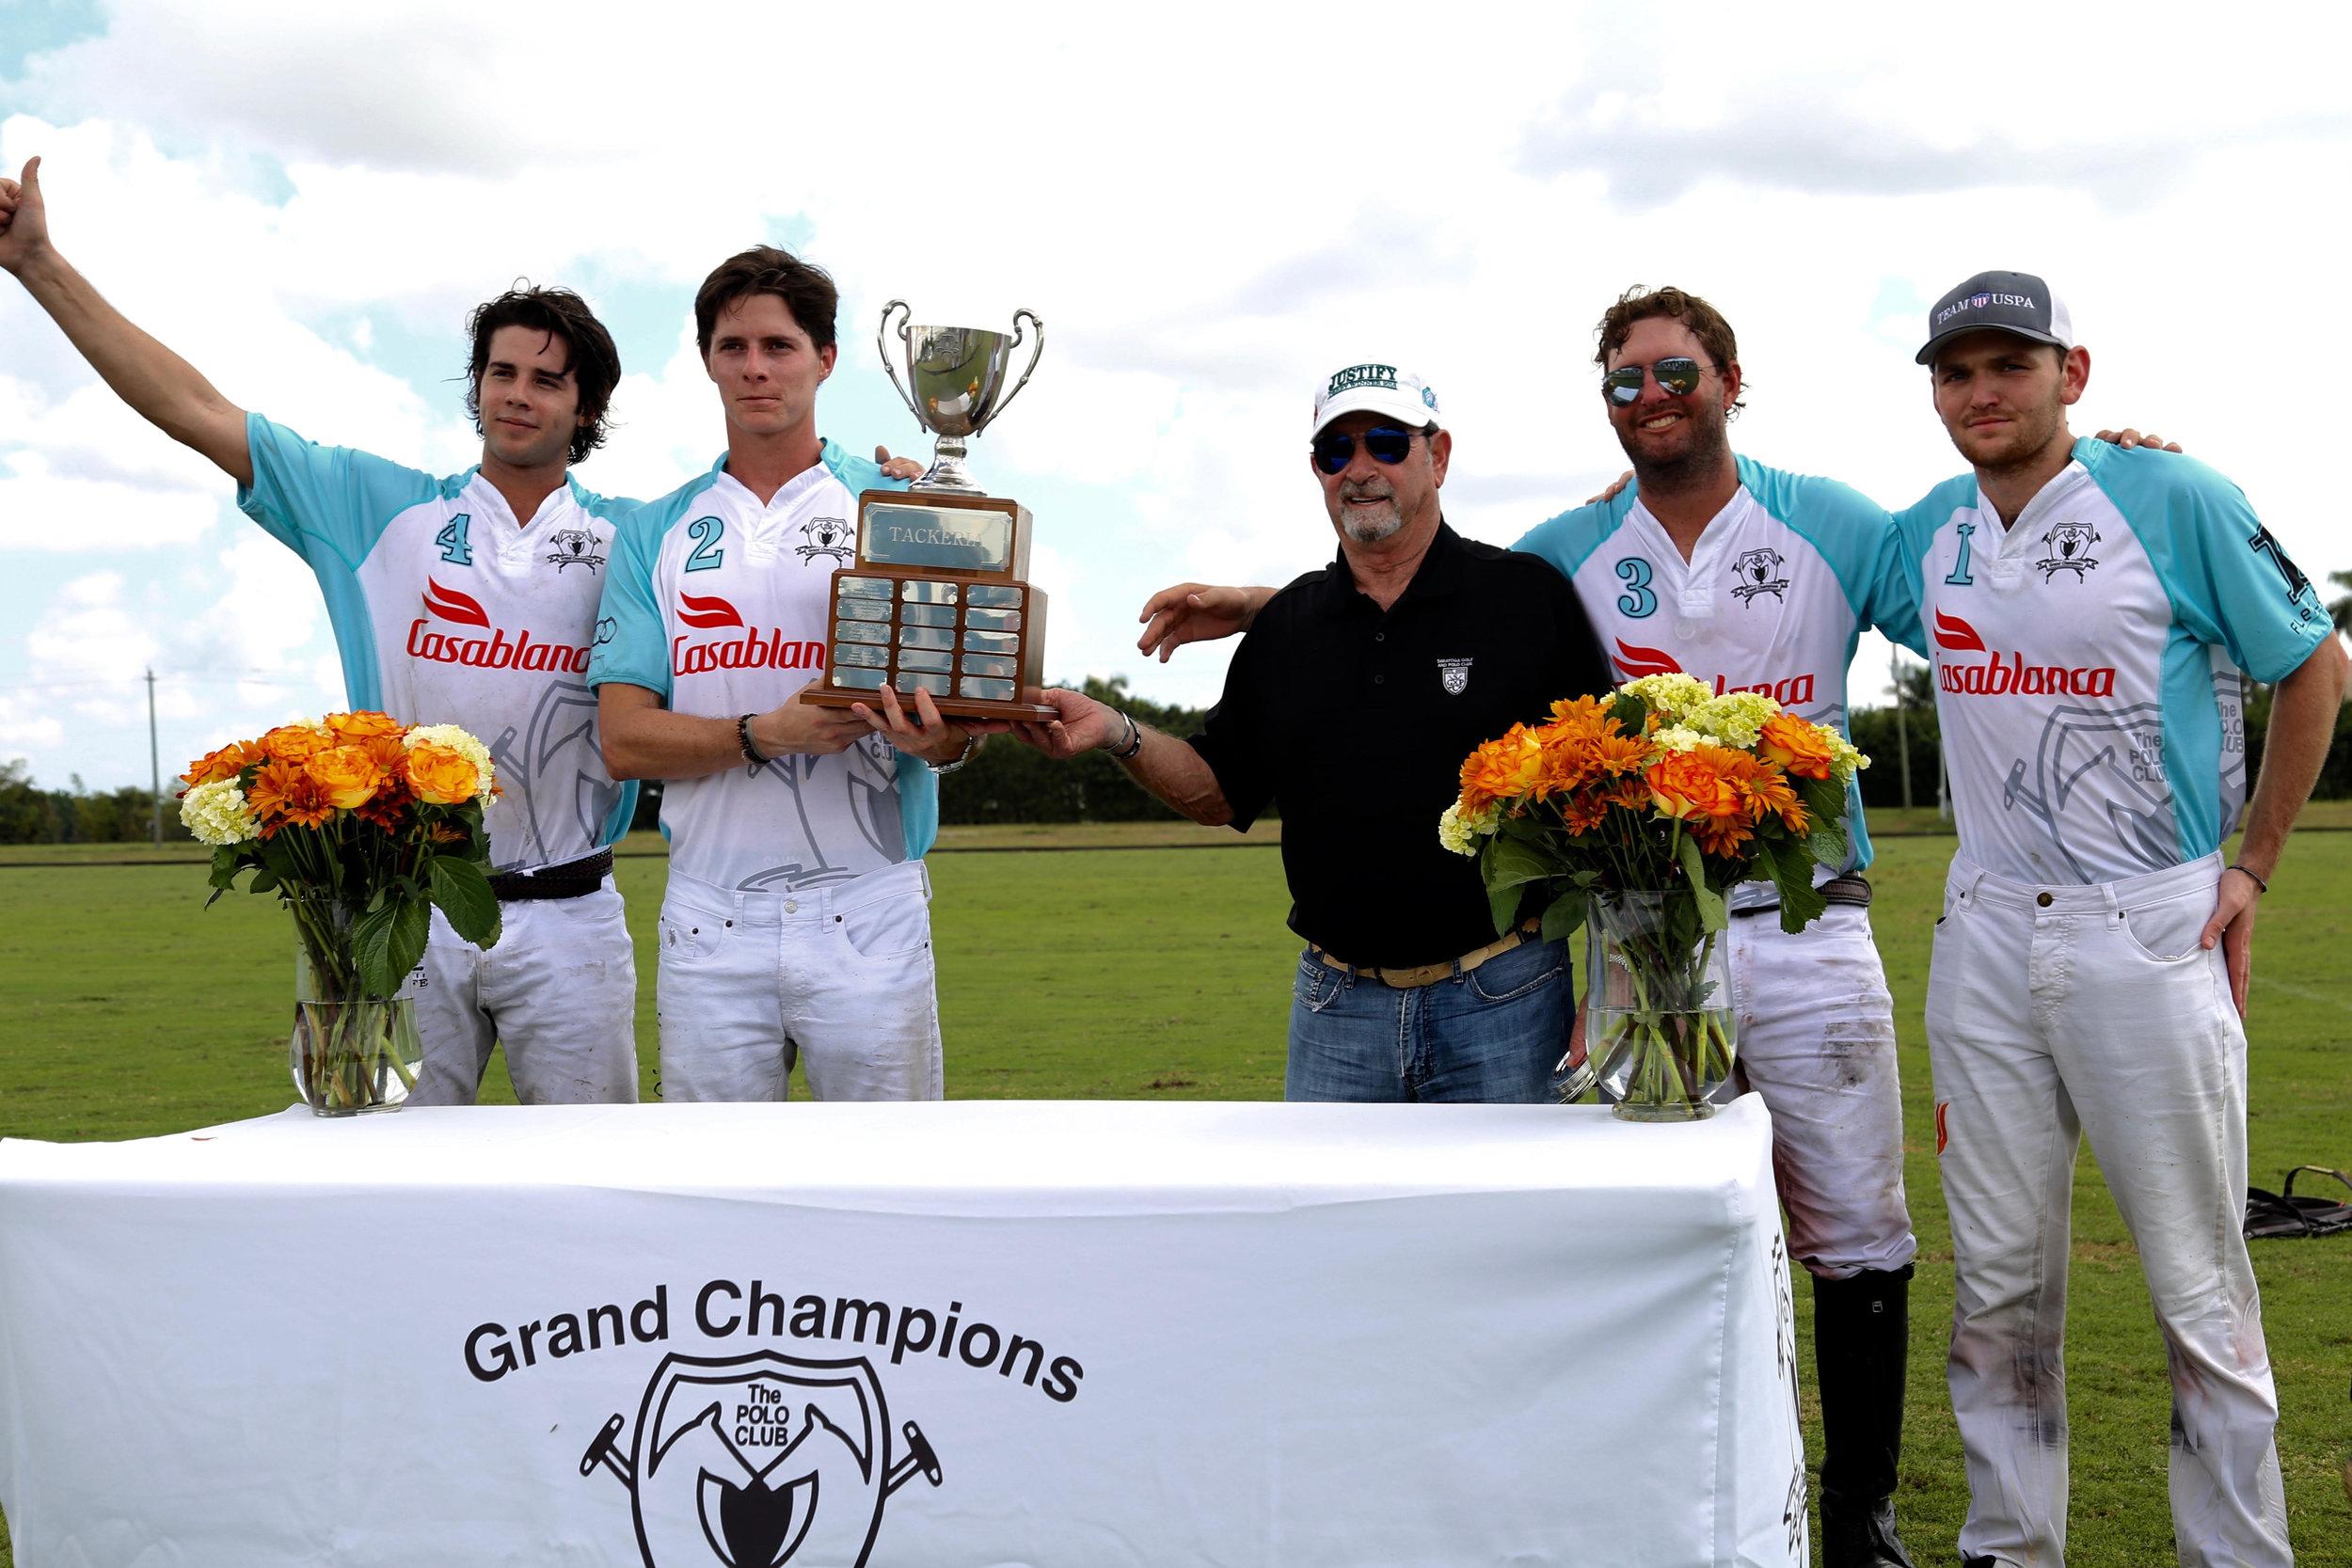 Casablanca winning teammates Mariano Gracida, Juancito Bollini, Julio Gracida and Grant Ganzi with awards presenter Tony Coppola.